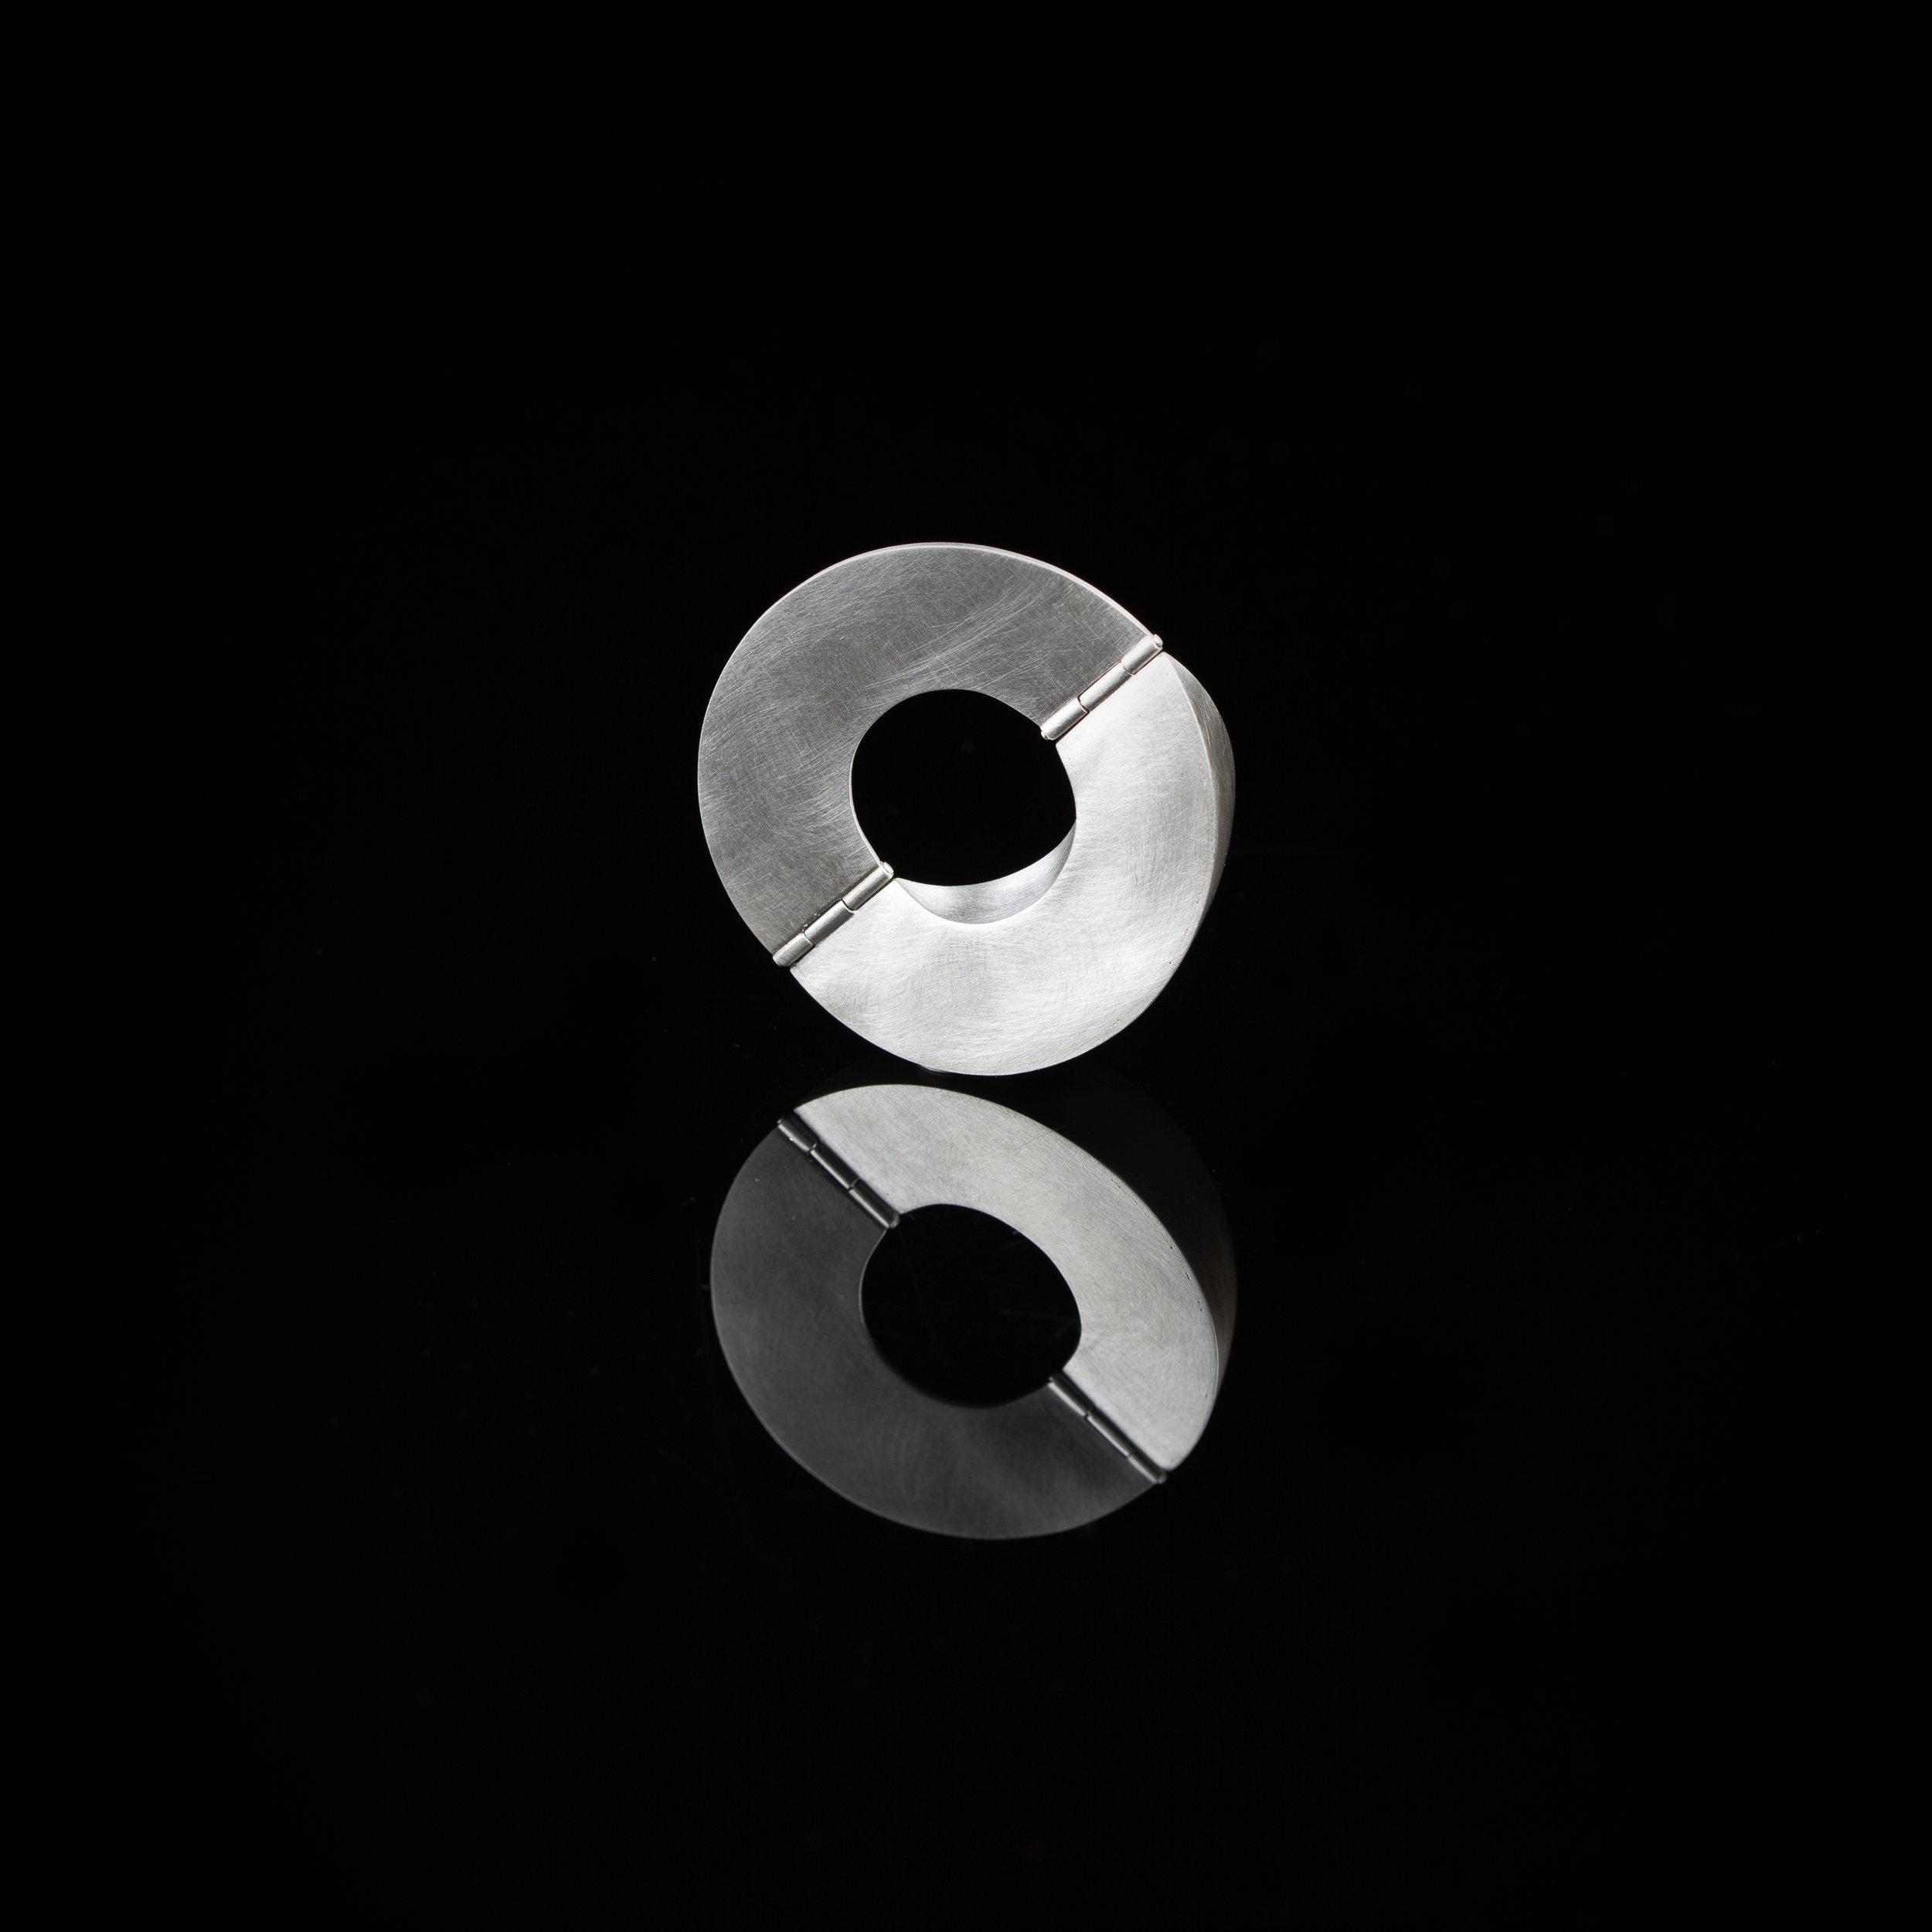 Curious Constructions | Pendant   Sterling Silver |4.3 x 4.3 x 1.6 cm